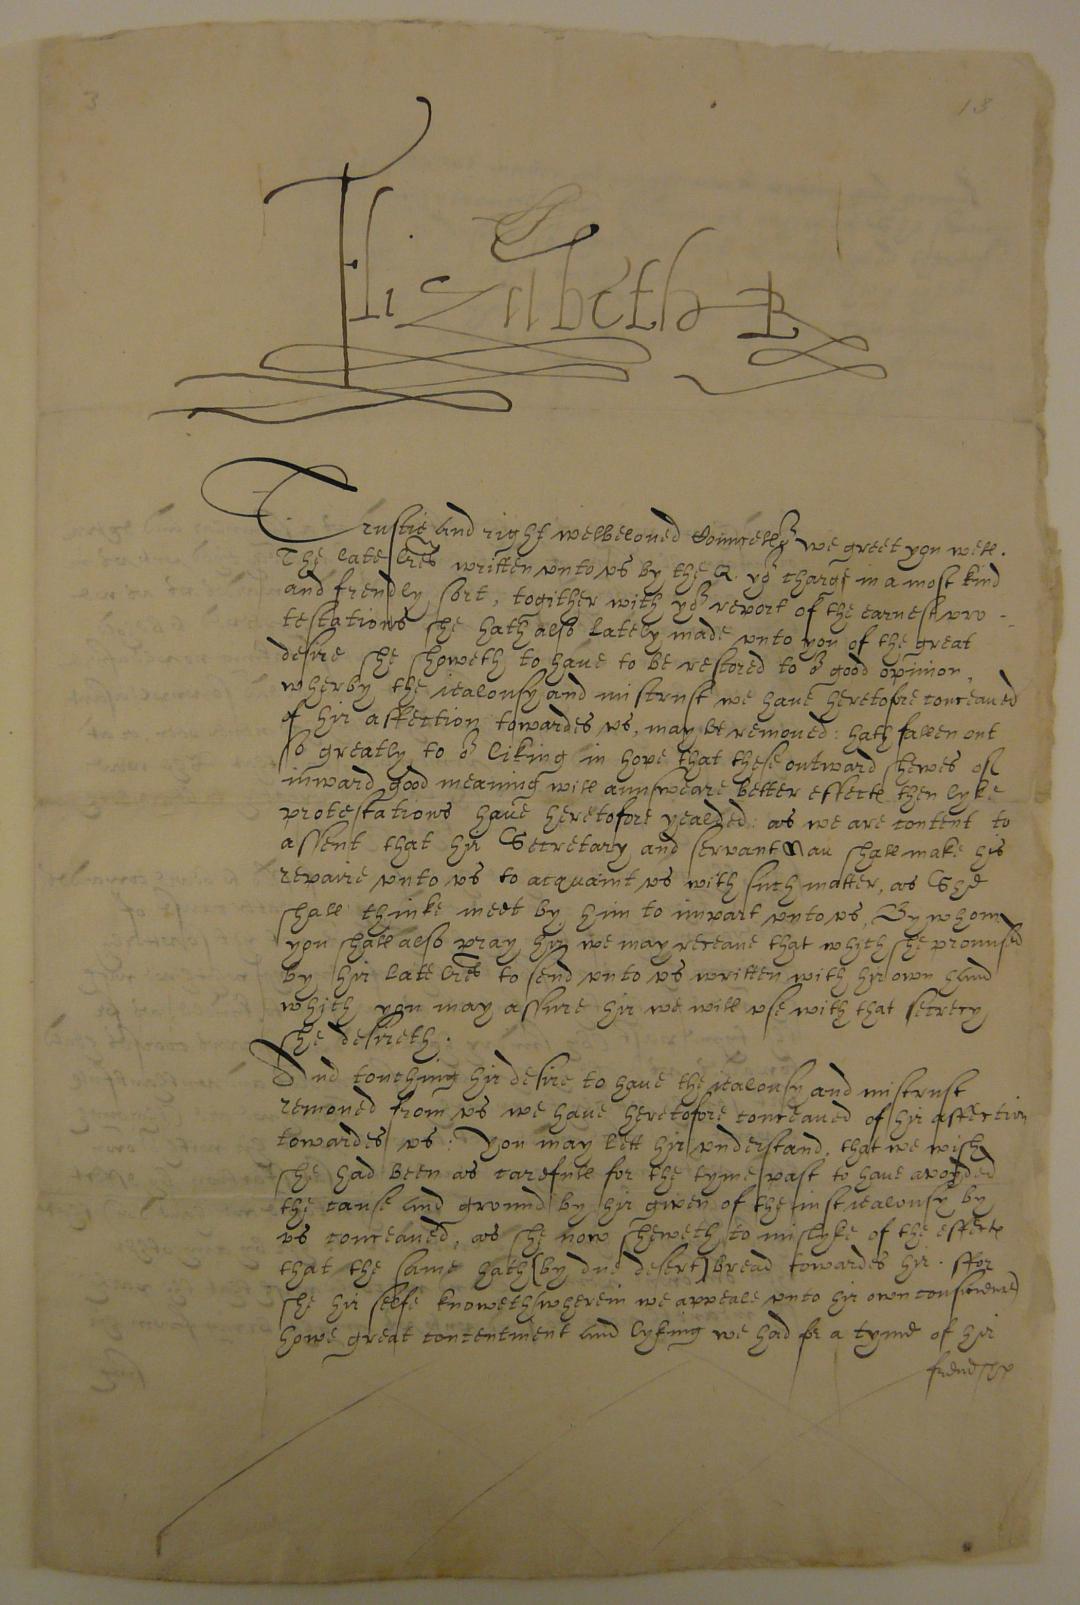 mary-q-scots-elizabeth-i-to-ralph-sadler-31-october-1584-59714.jpg